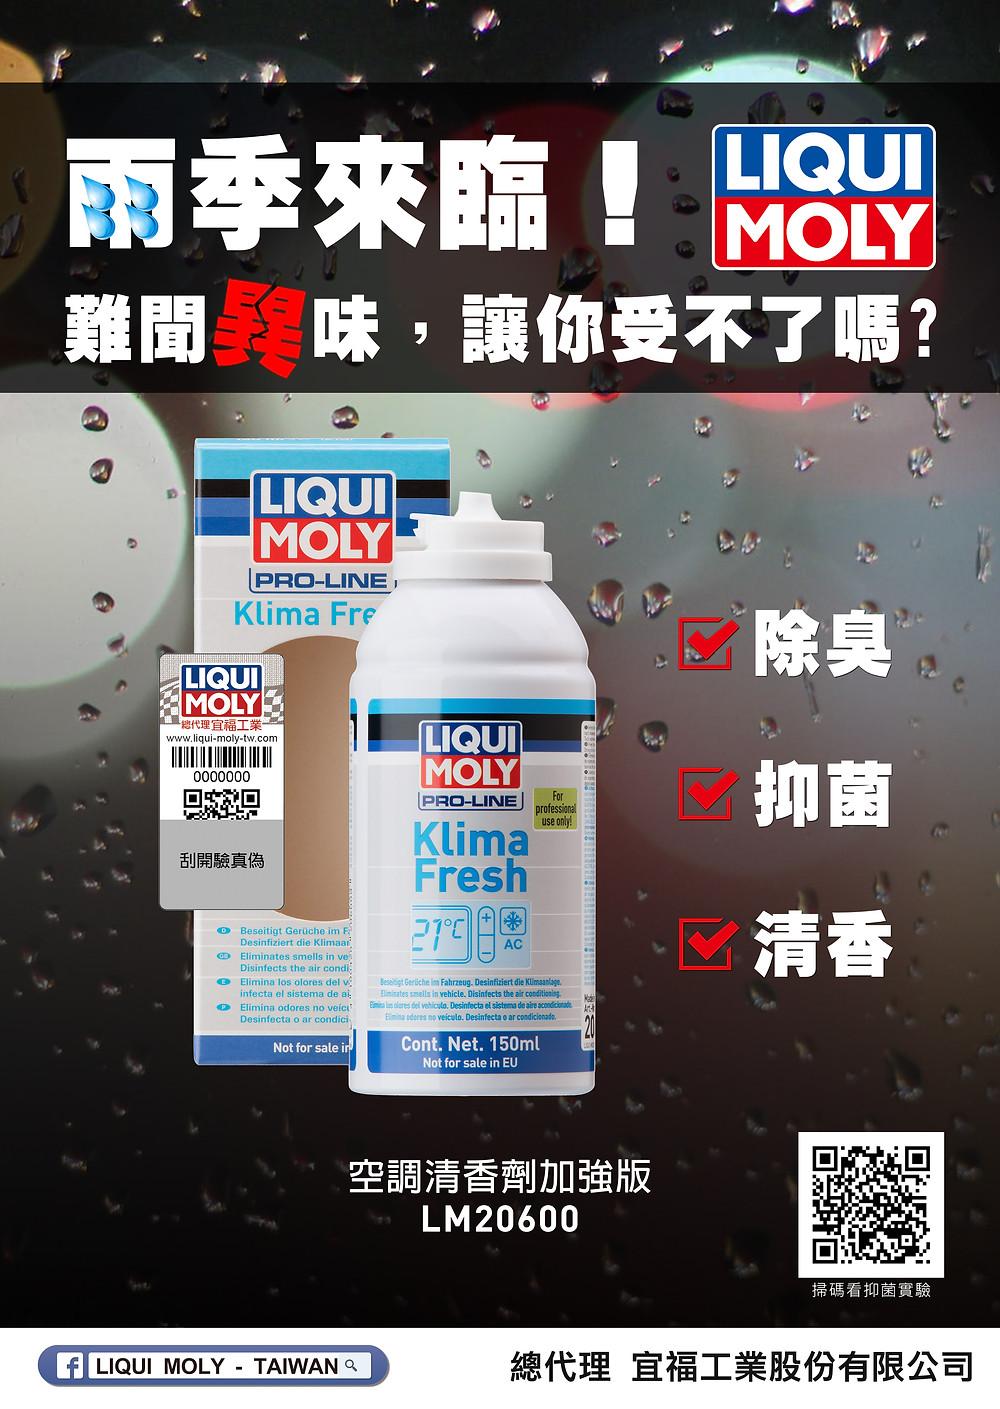 LIQUI MOLY 空調清香劑加強版